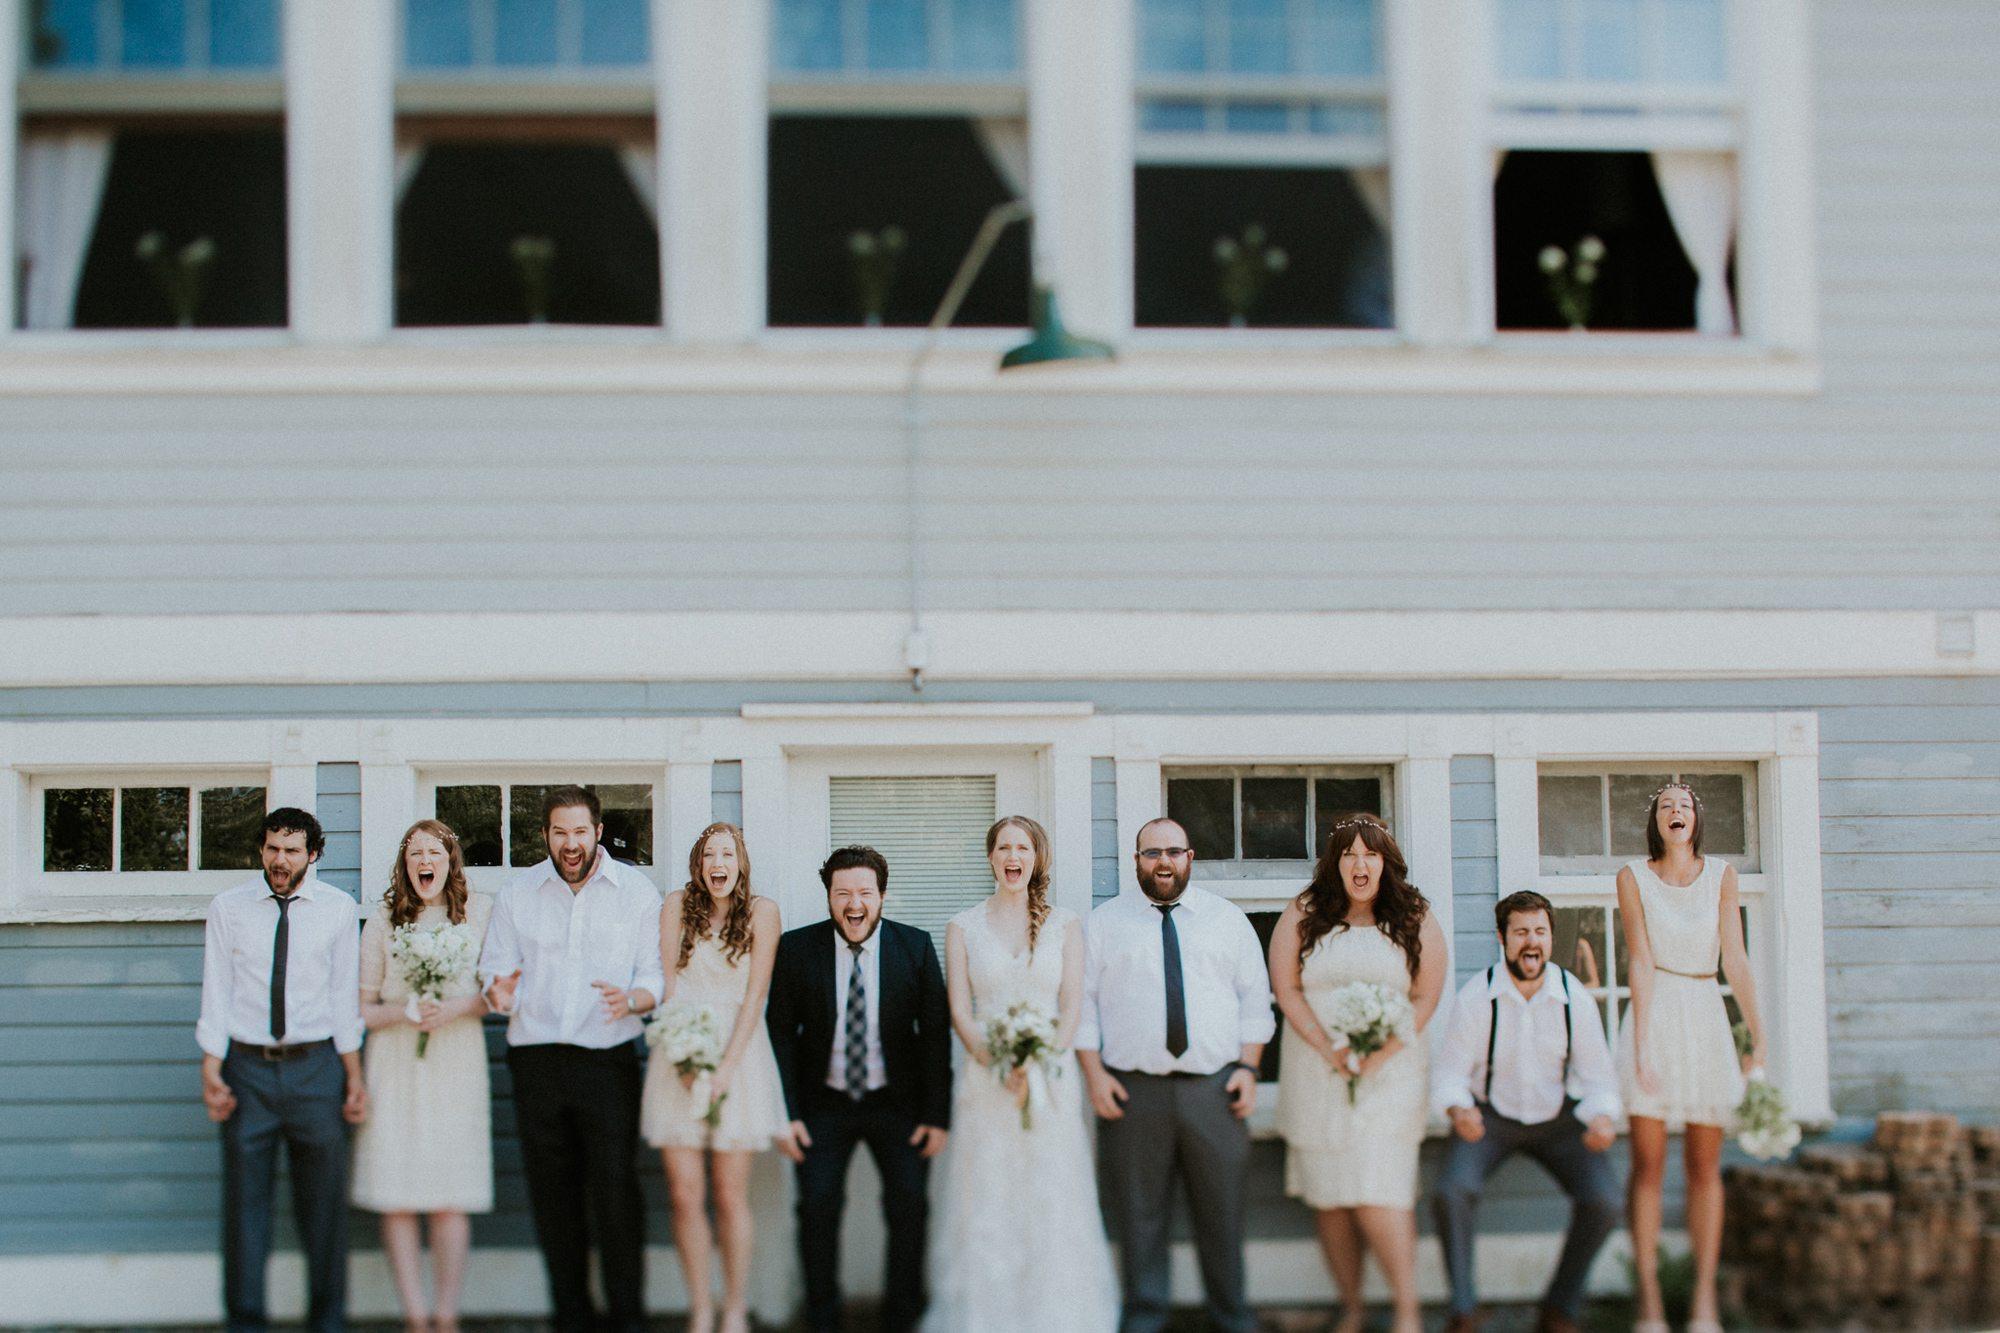 842-abbotsford-wedding-photographer